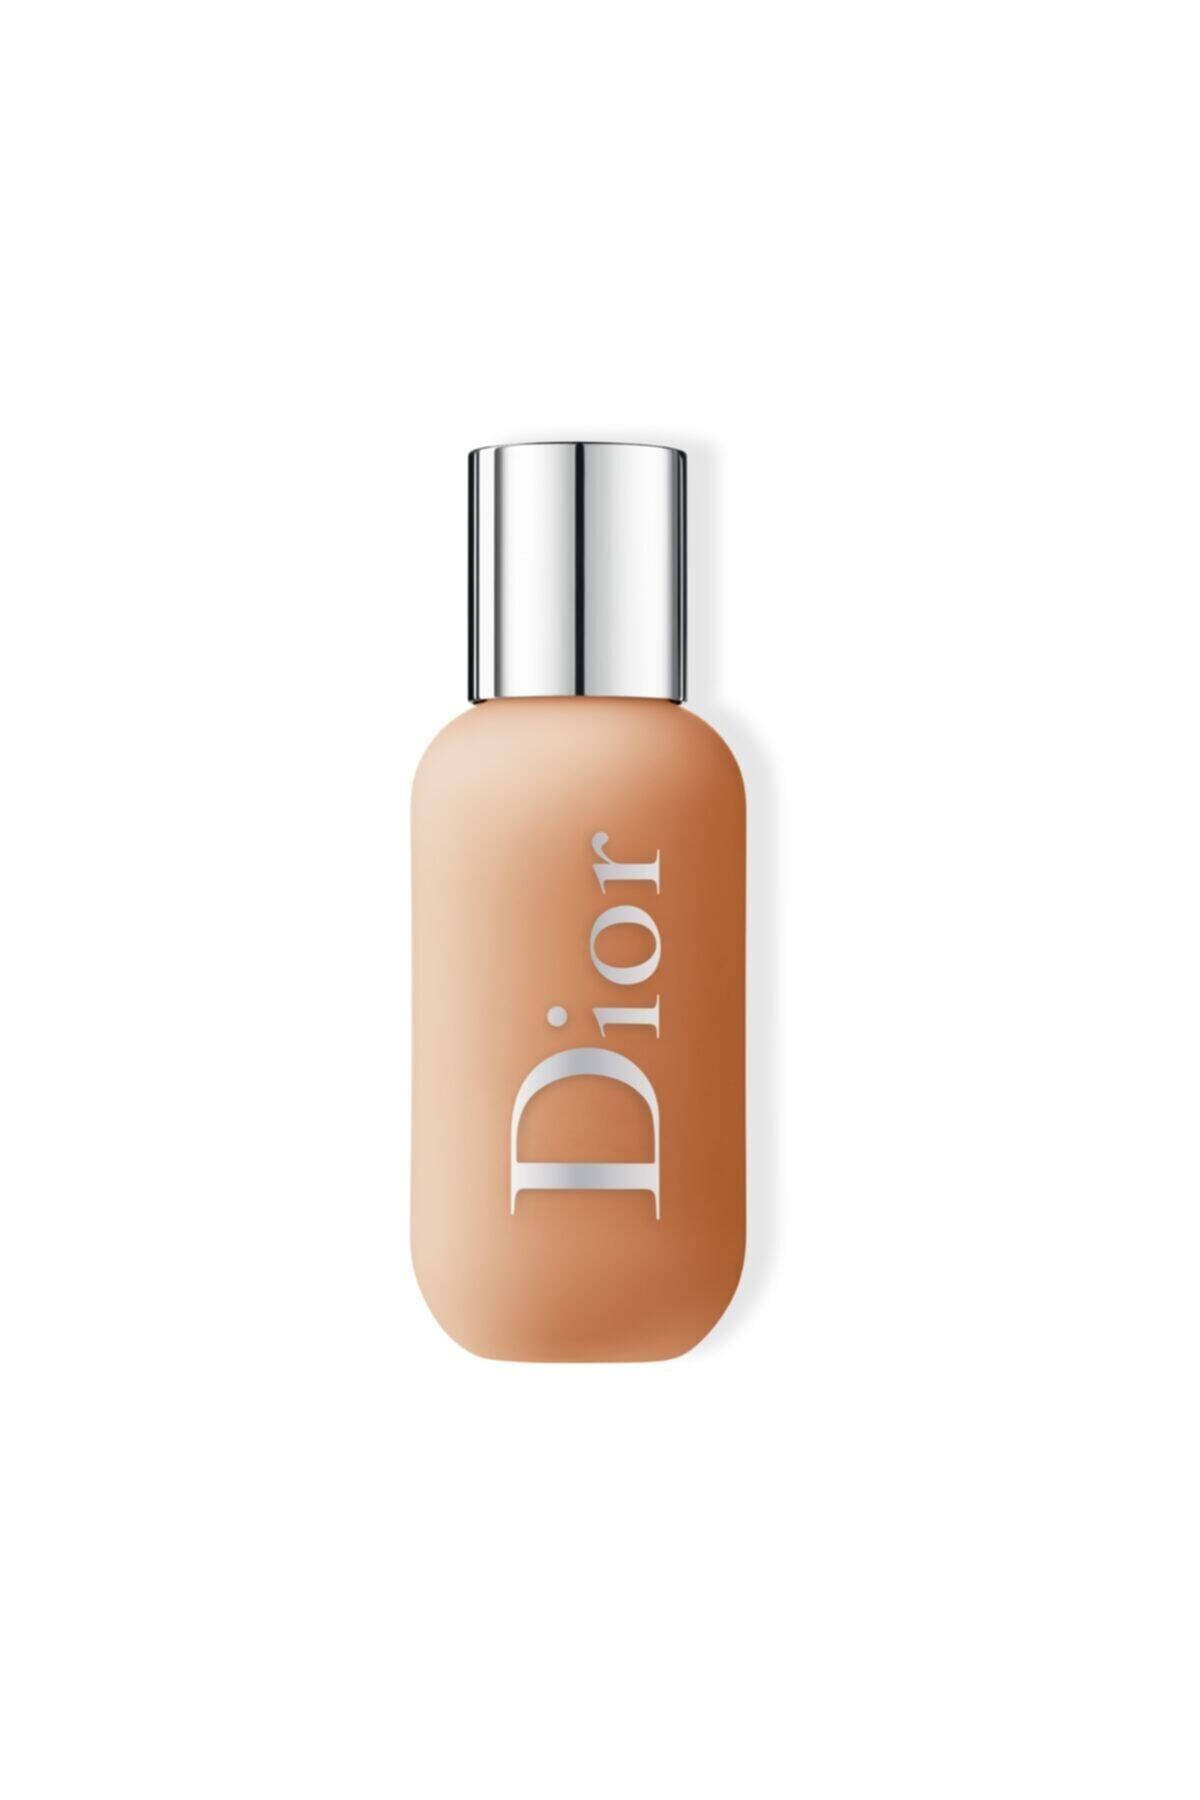 Dior Backstage Face And Body Fondöten 2w Warm 870025846202 1